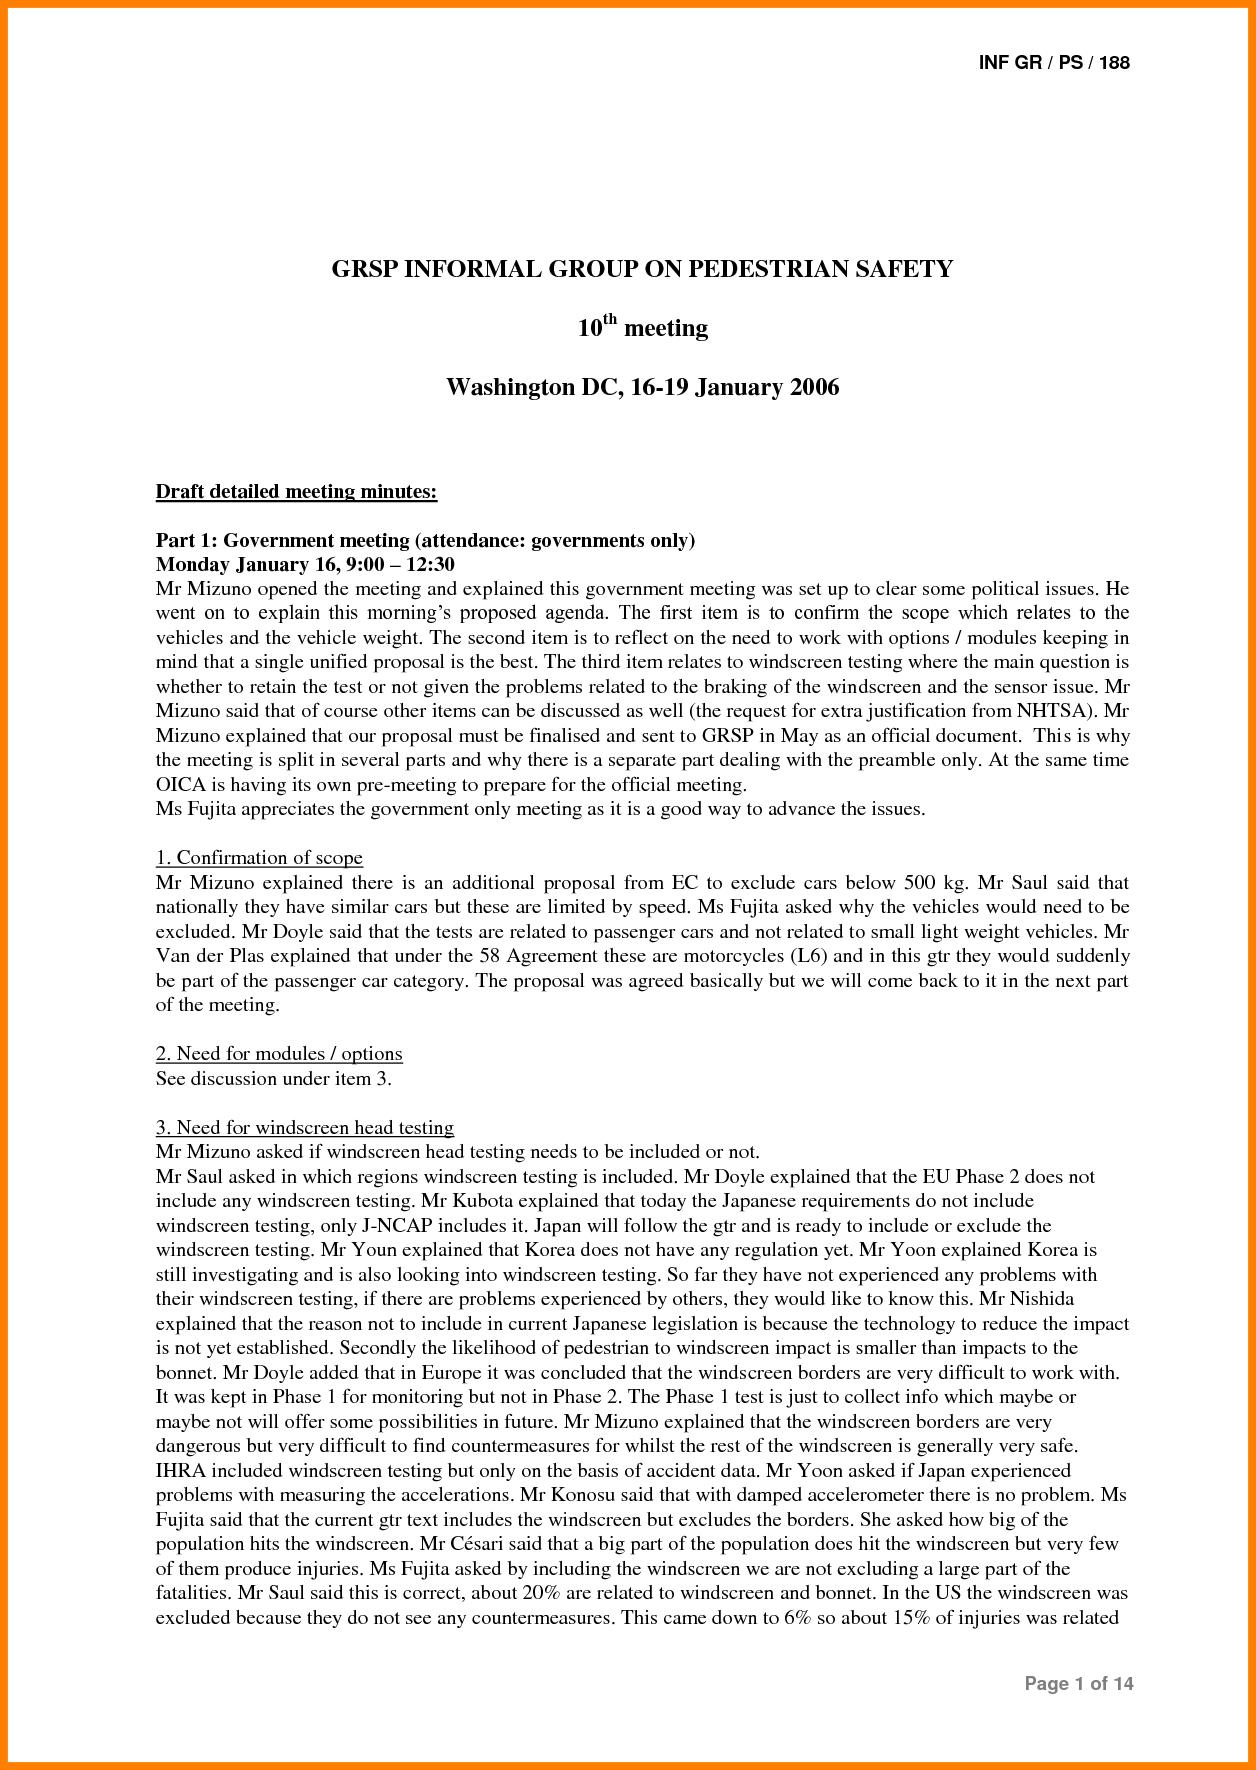 005 Usc Essays Essay Outstanding Supplemental Tips Mba Sample Engineering Full